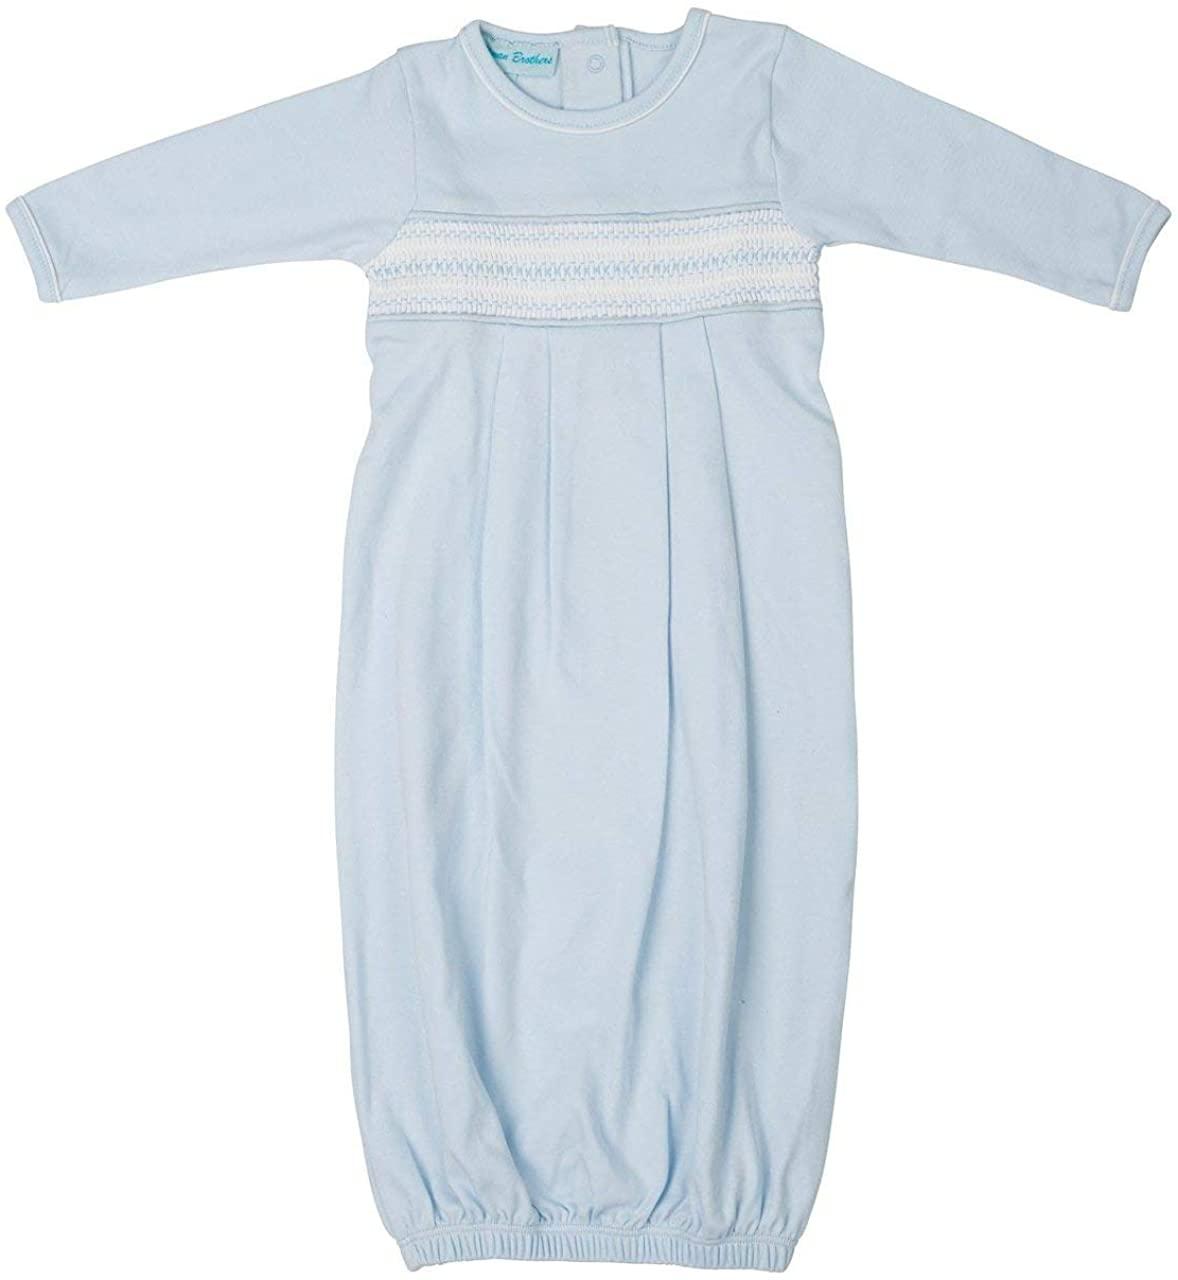 Feltman Brothers Baby Boy's Blue Smocked Diamond Gown